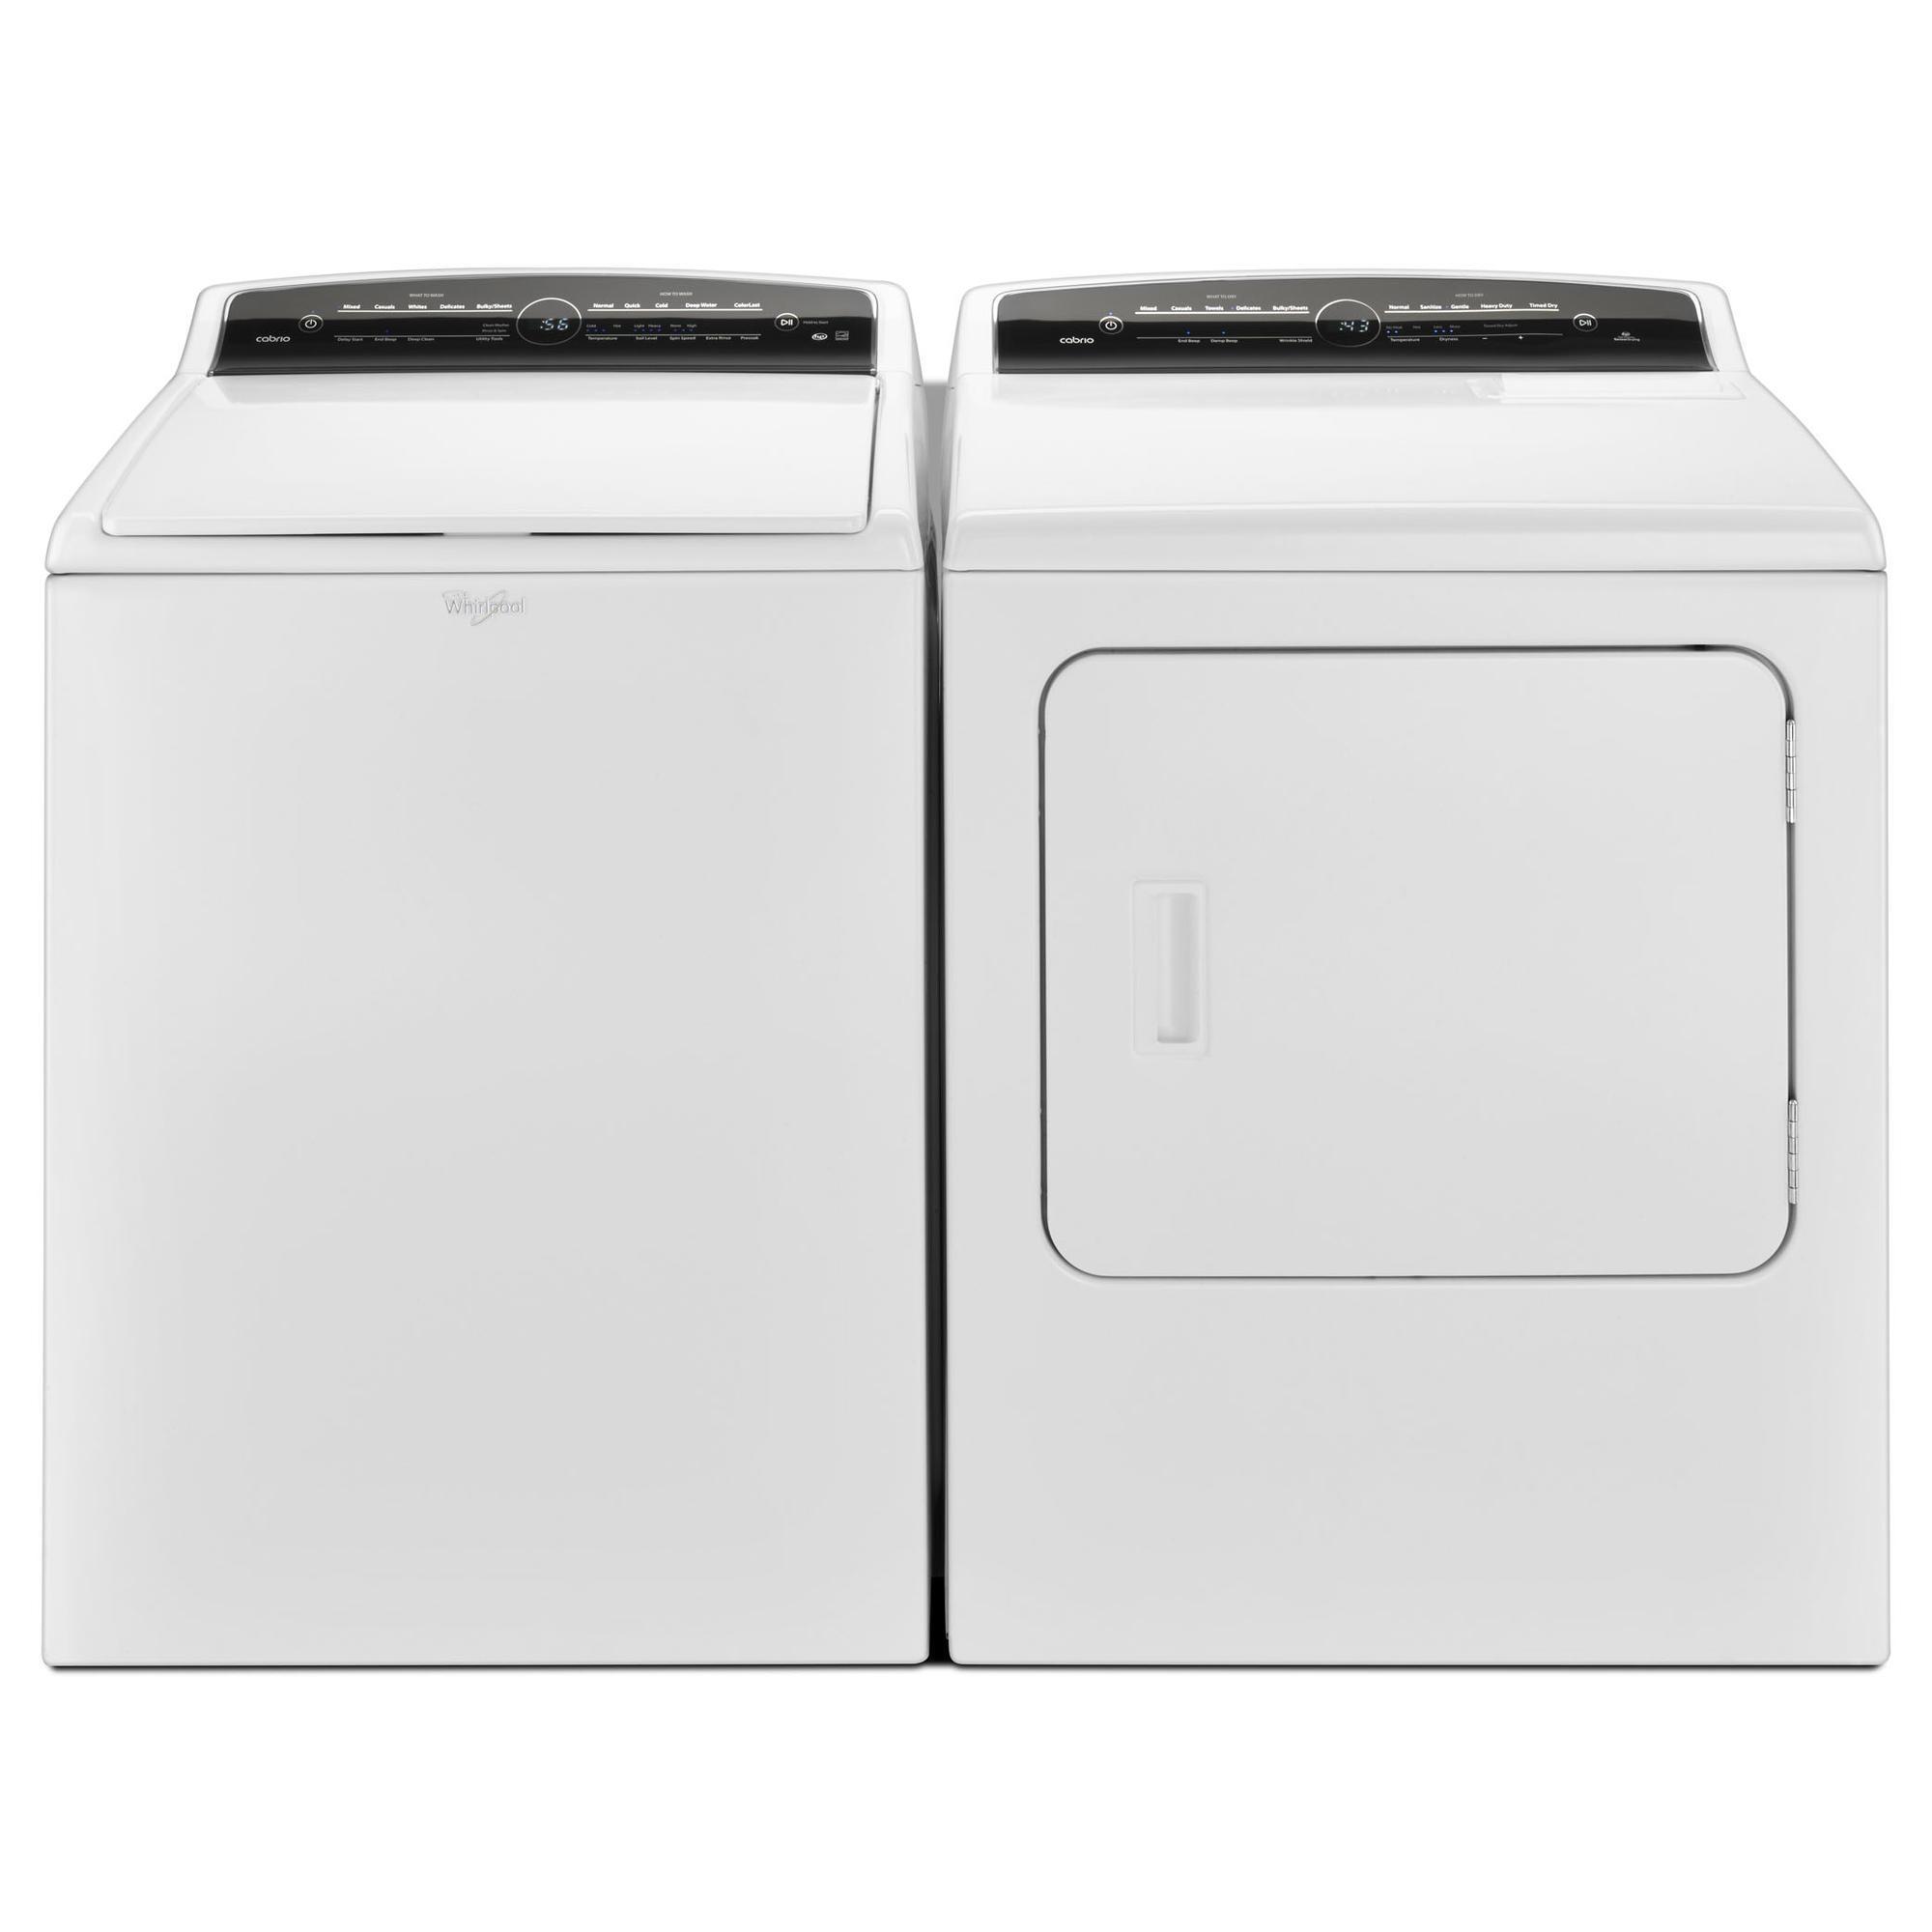 4.8 cu. ft. Cabrio® Top Load Washer & 7.0 cu. ft. Cabrio® High-Efficiency Dryer